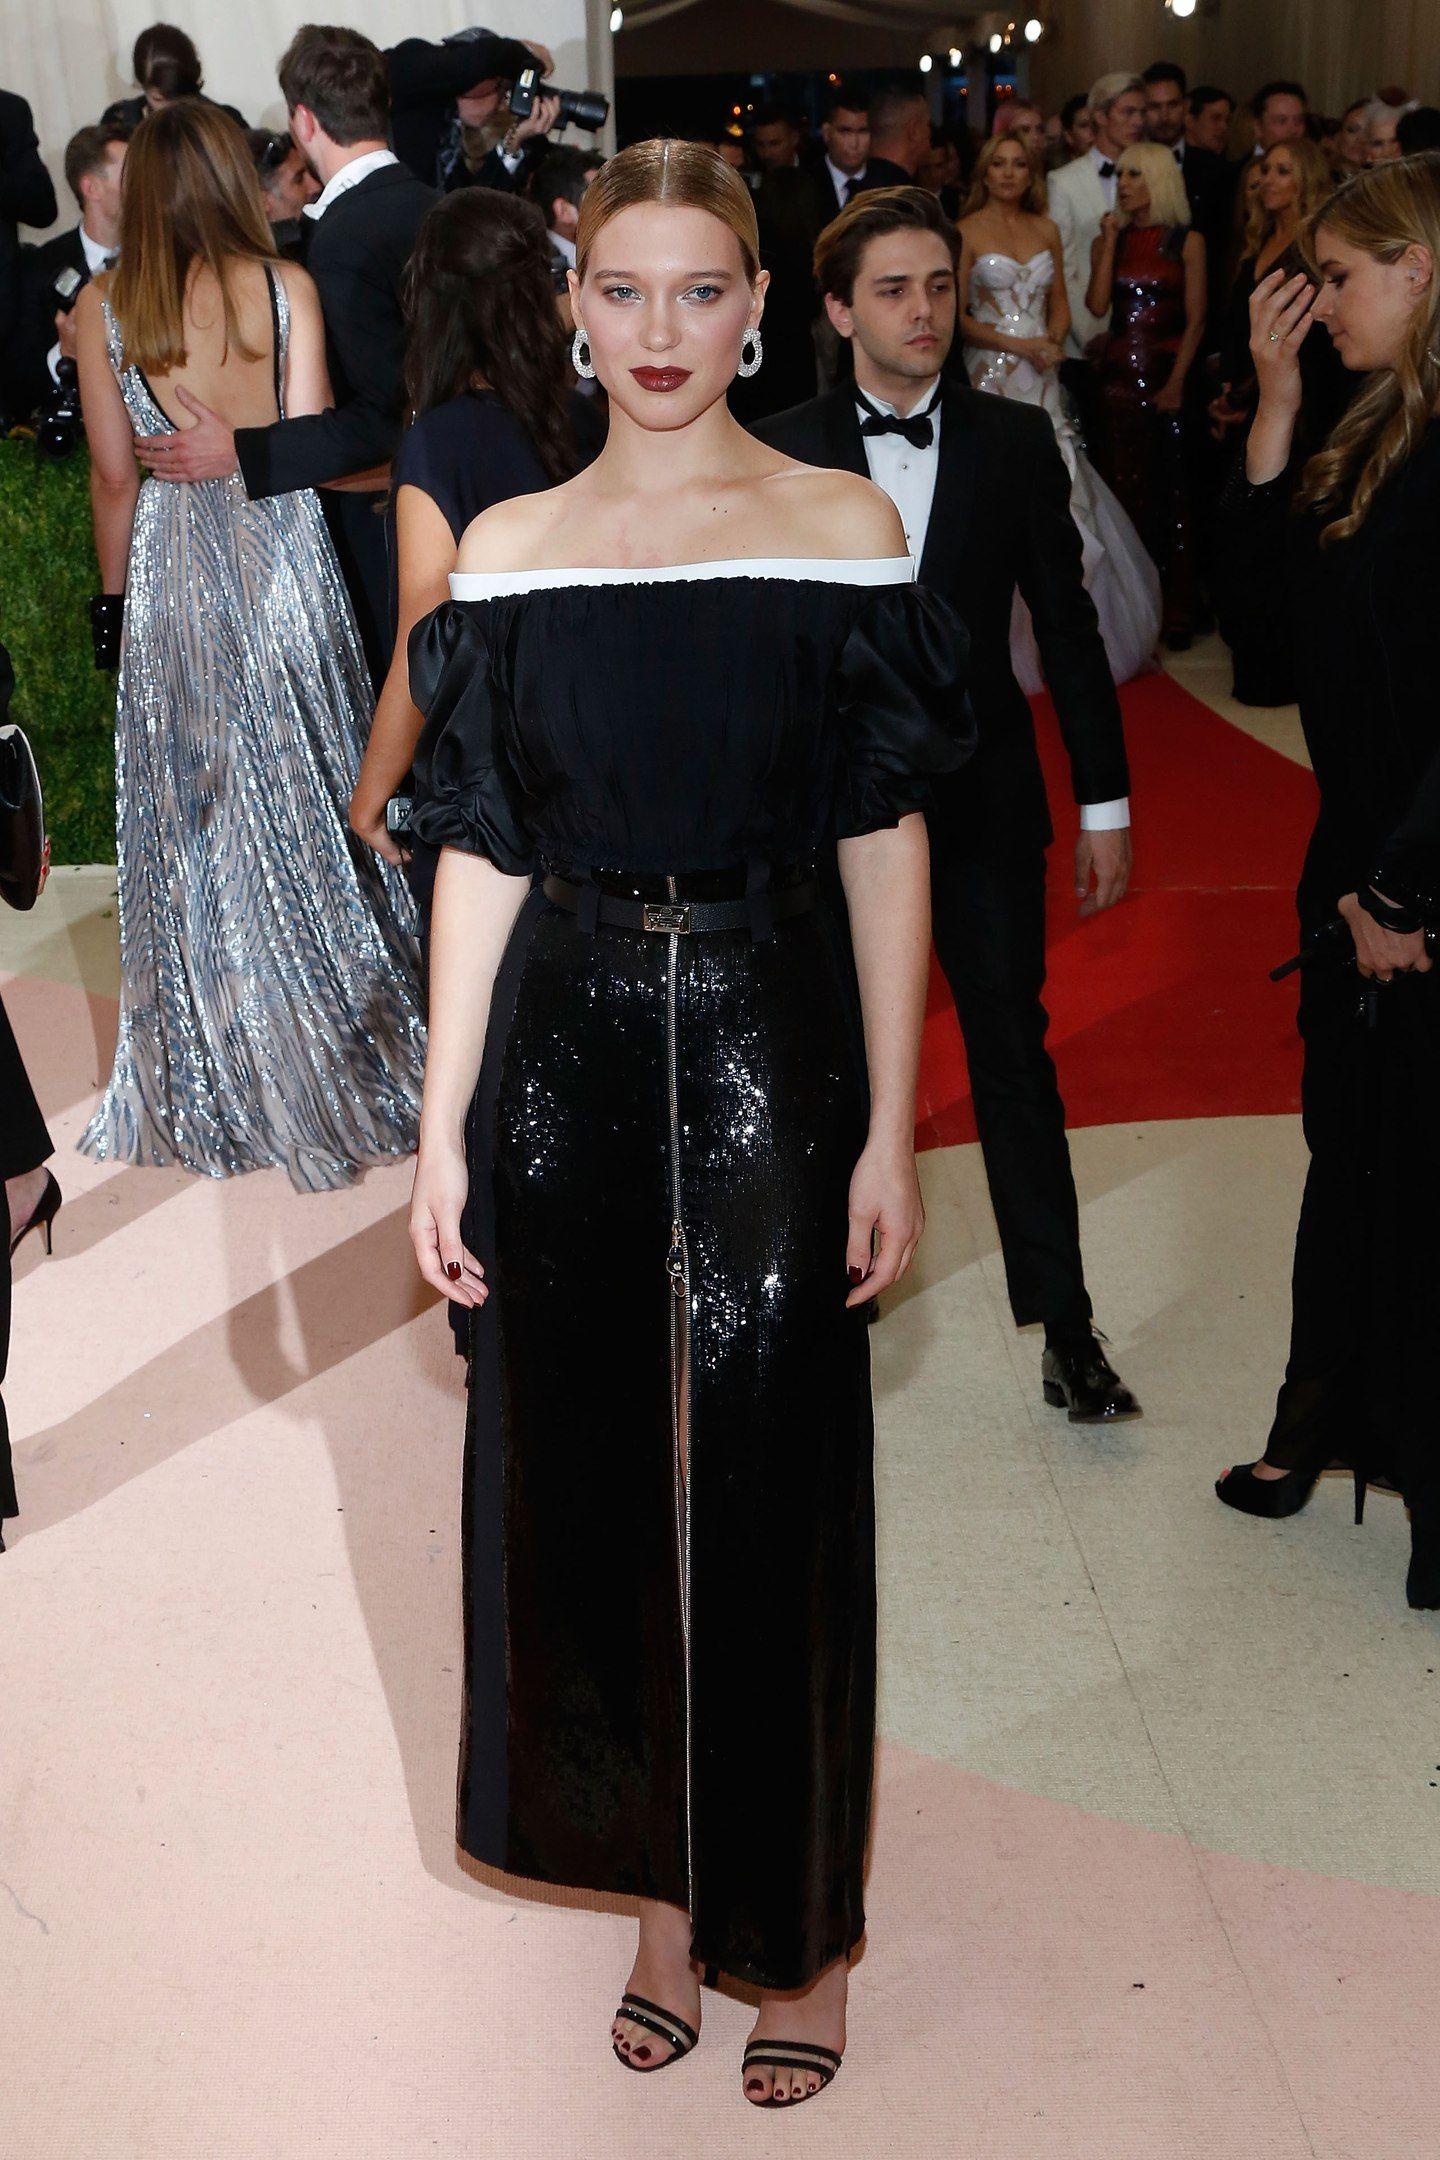 Léa Seydoux in Louis Vuitton at 2016 Met Gala in New York